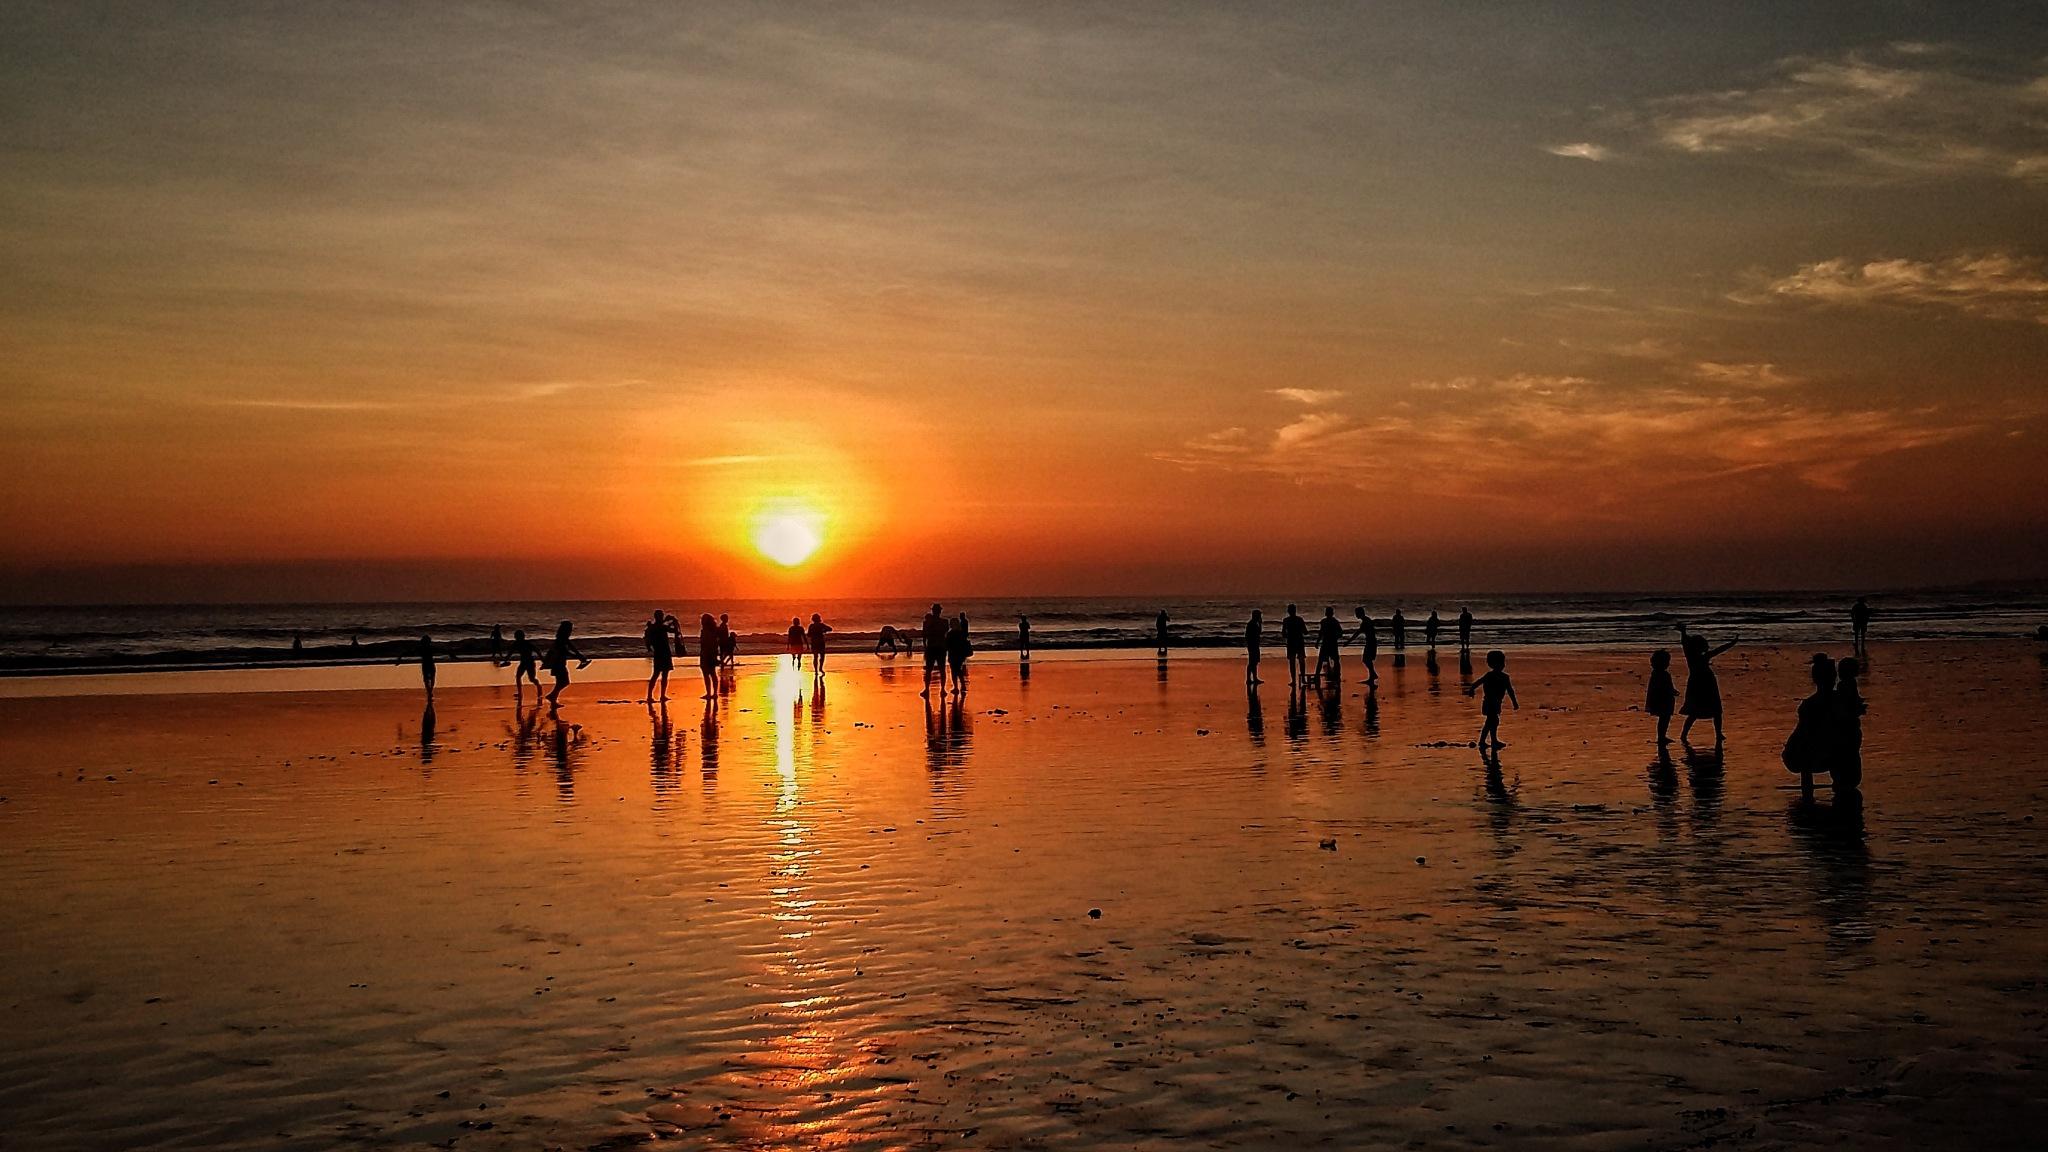 bali sunset by Vita Dewi Aprilia